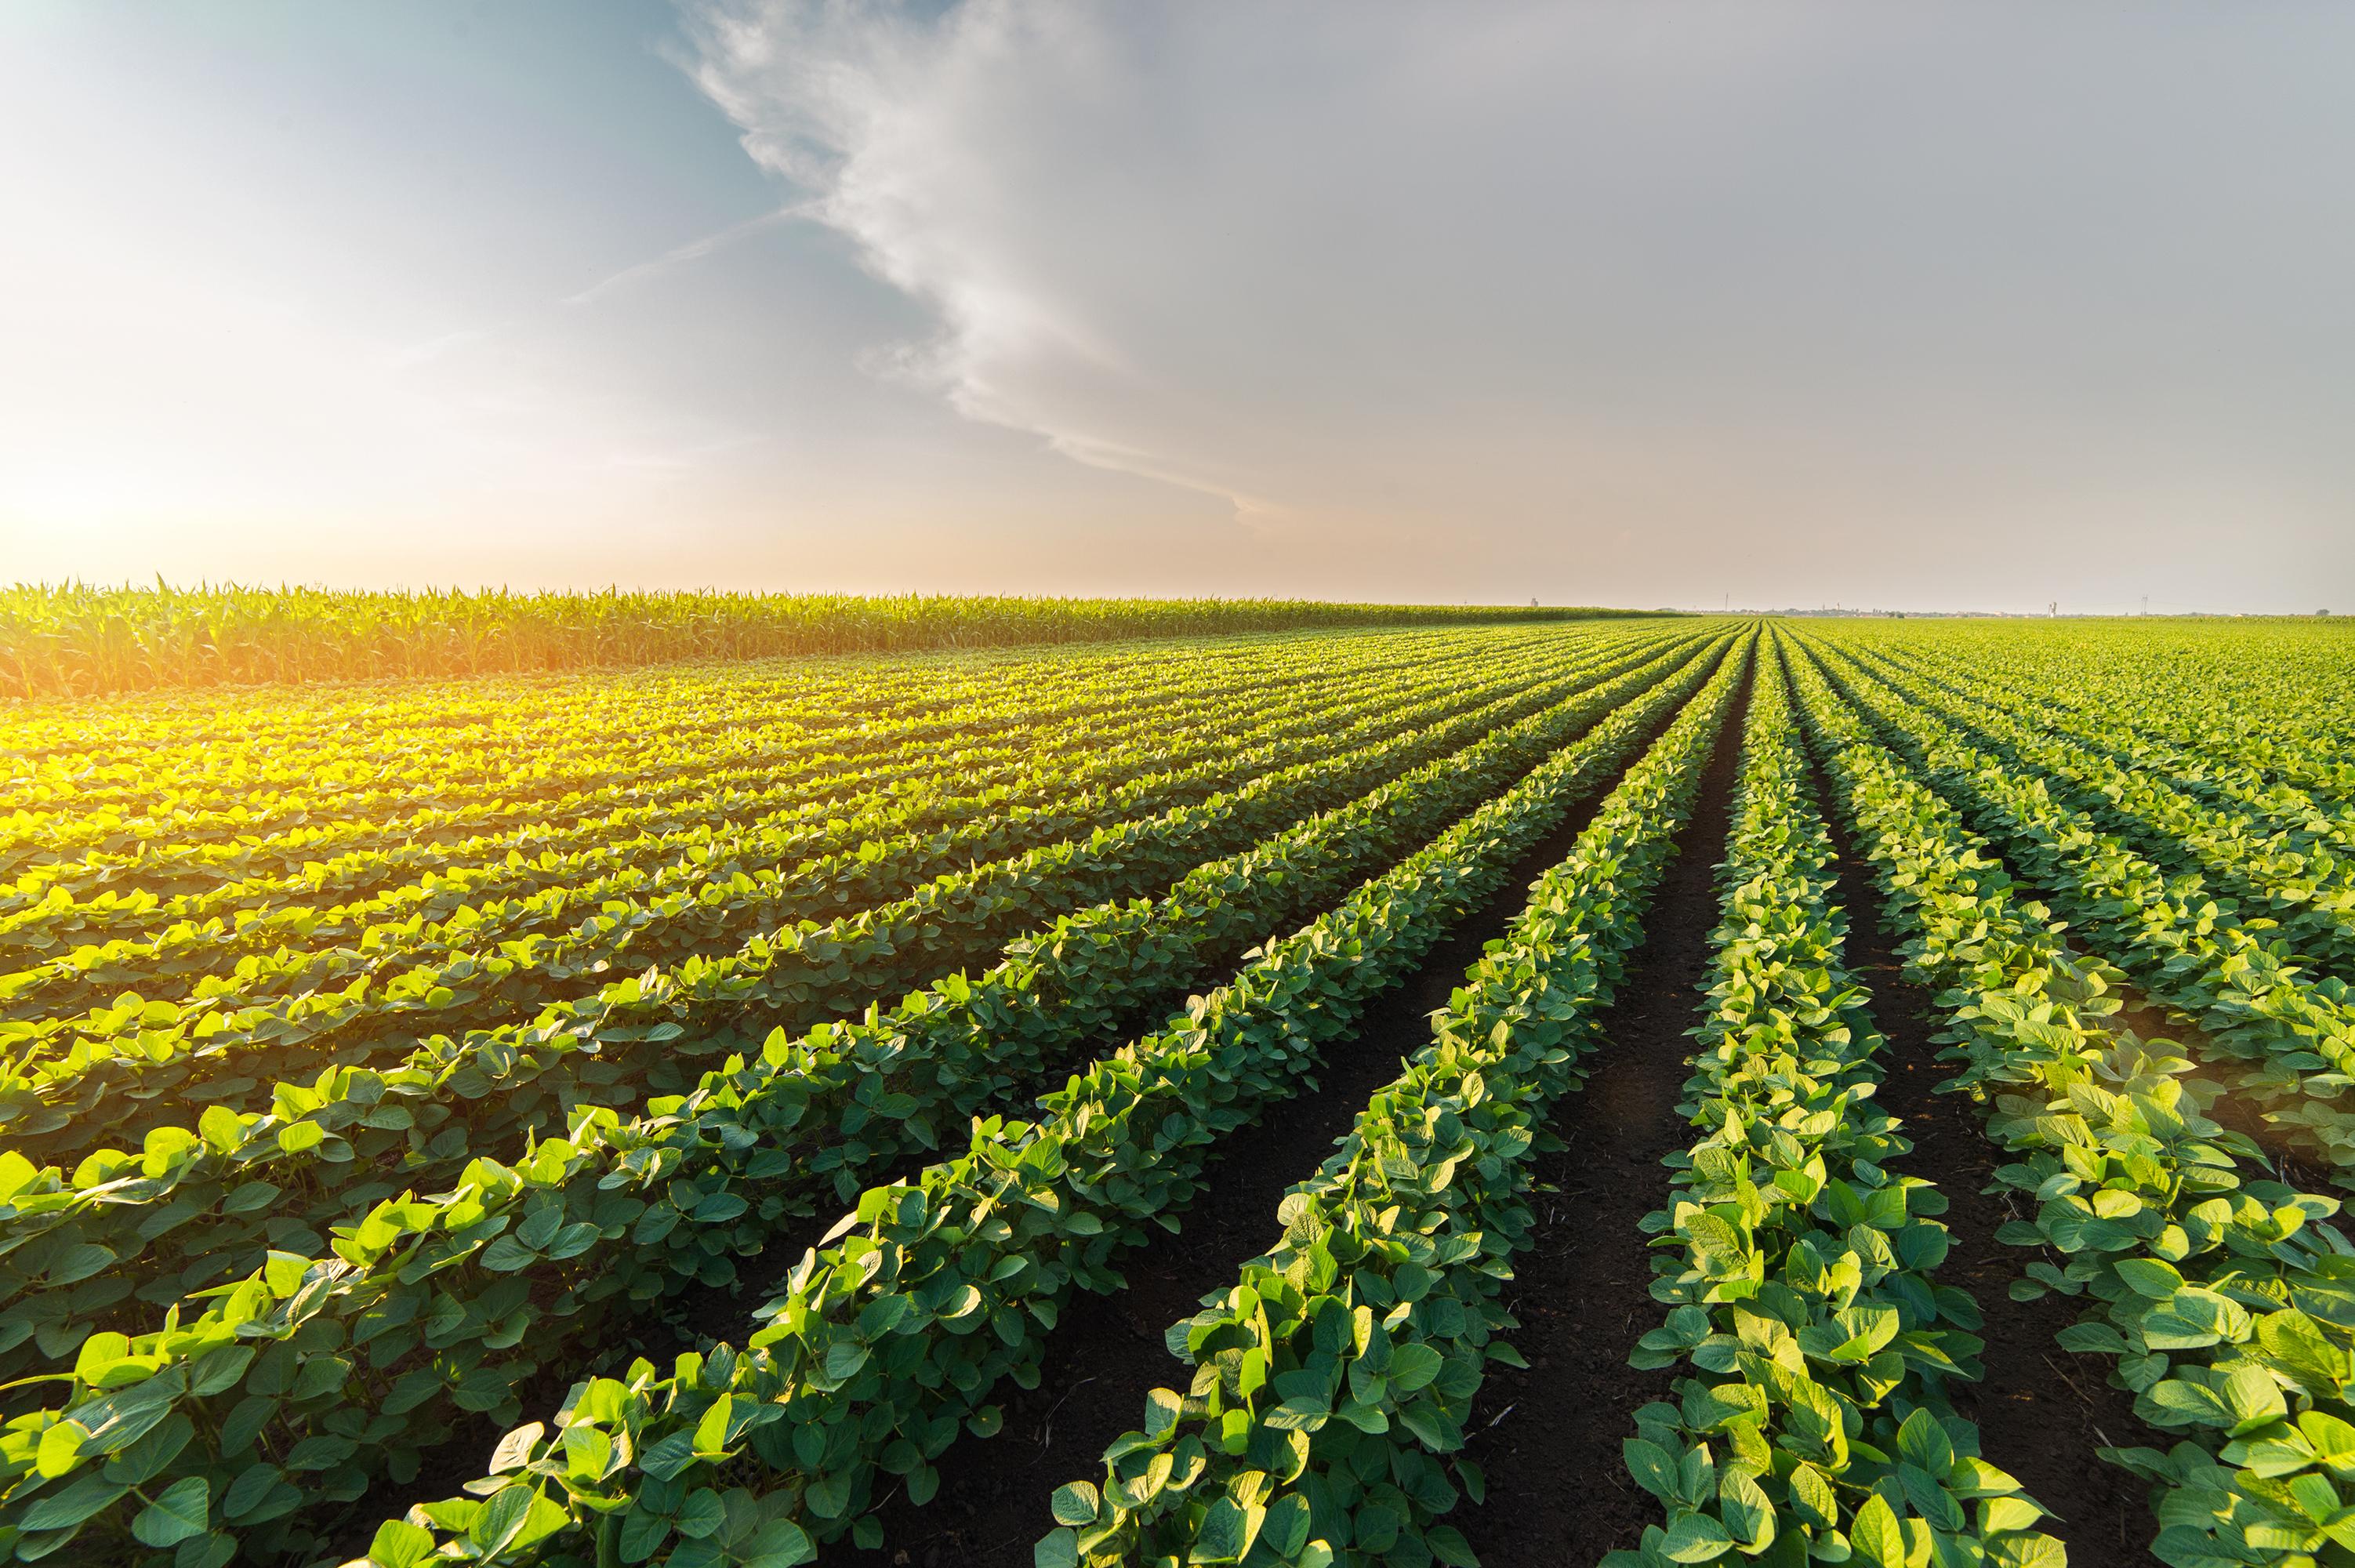 A soybean field.